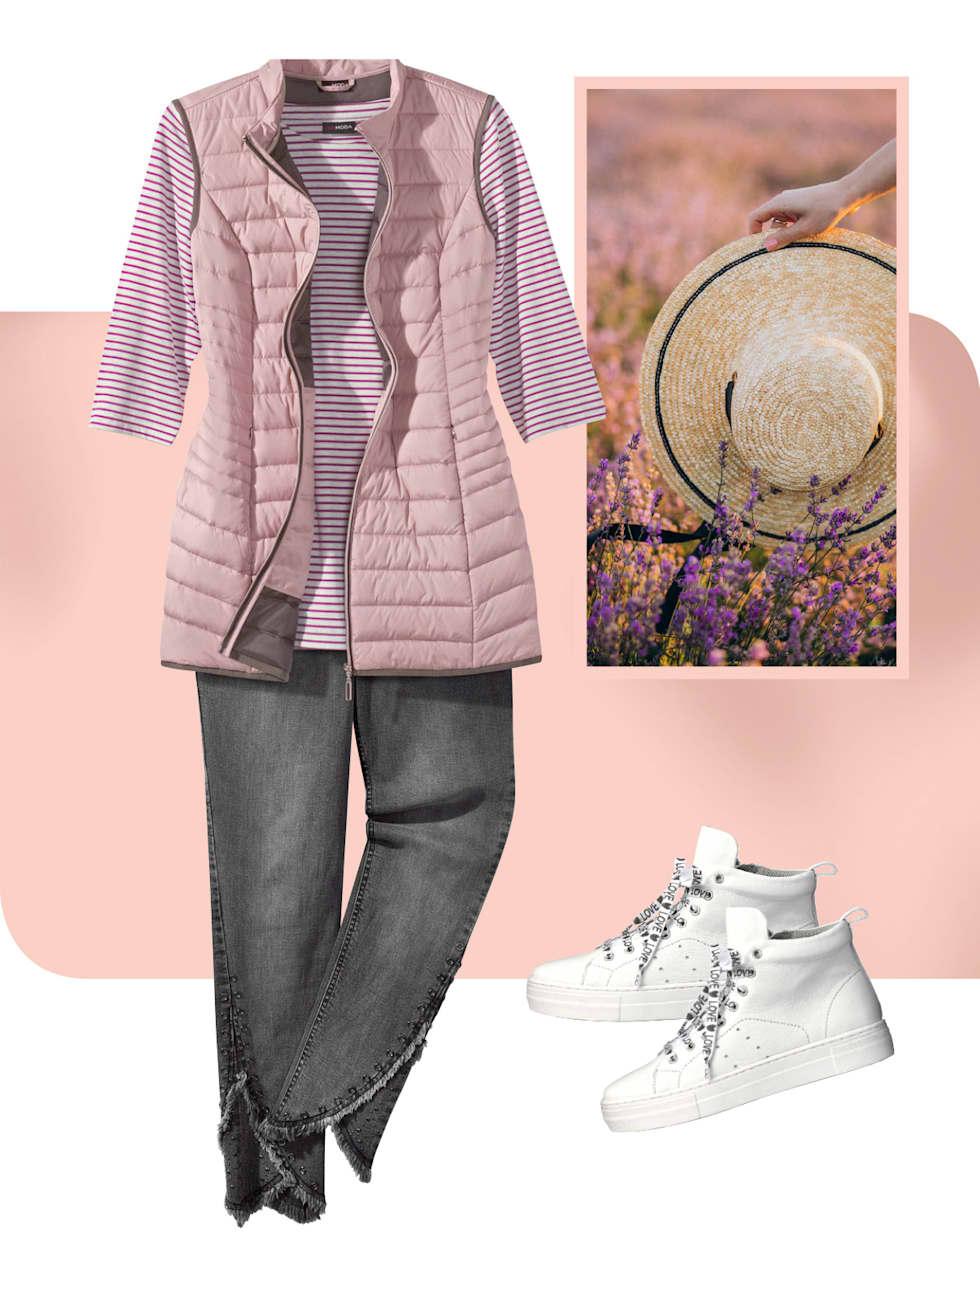 MIAMODA Grosse Grössen Kampagne strahlende Farben - Outfit in der Farbe lila